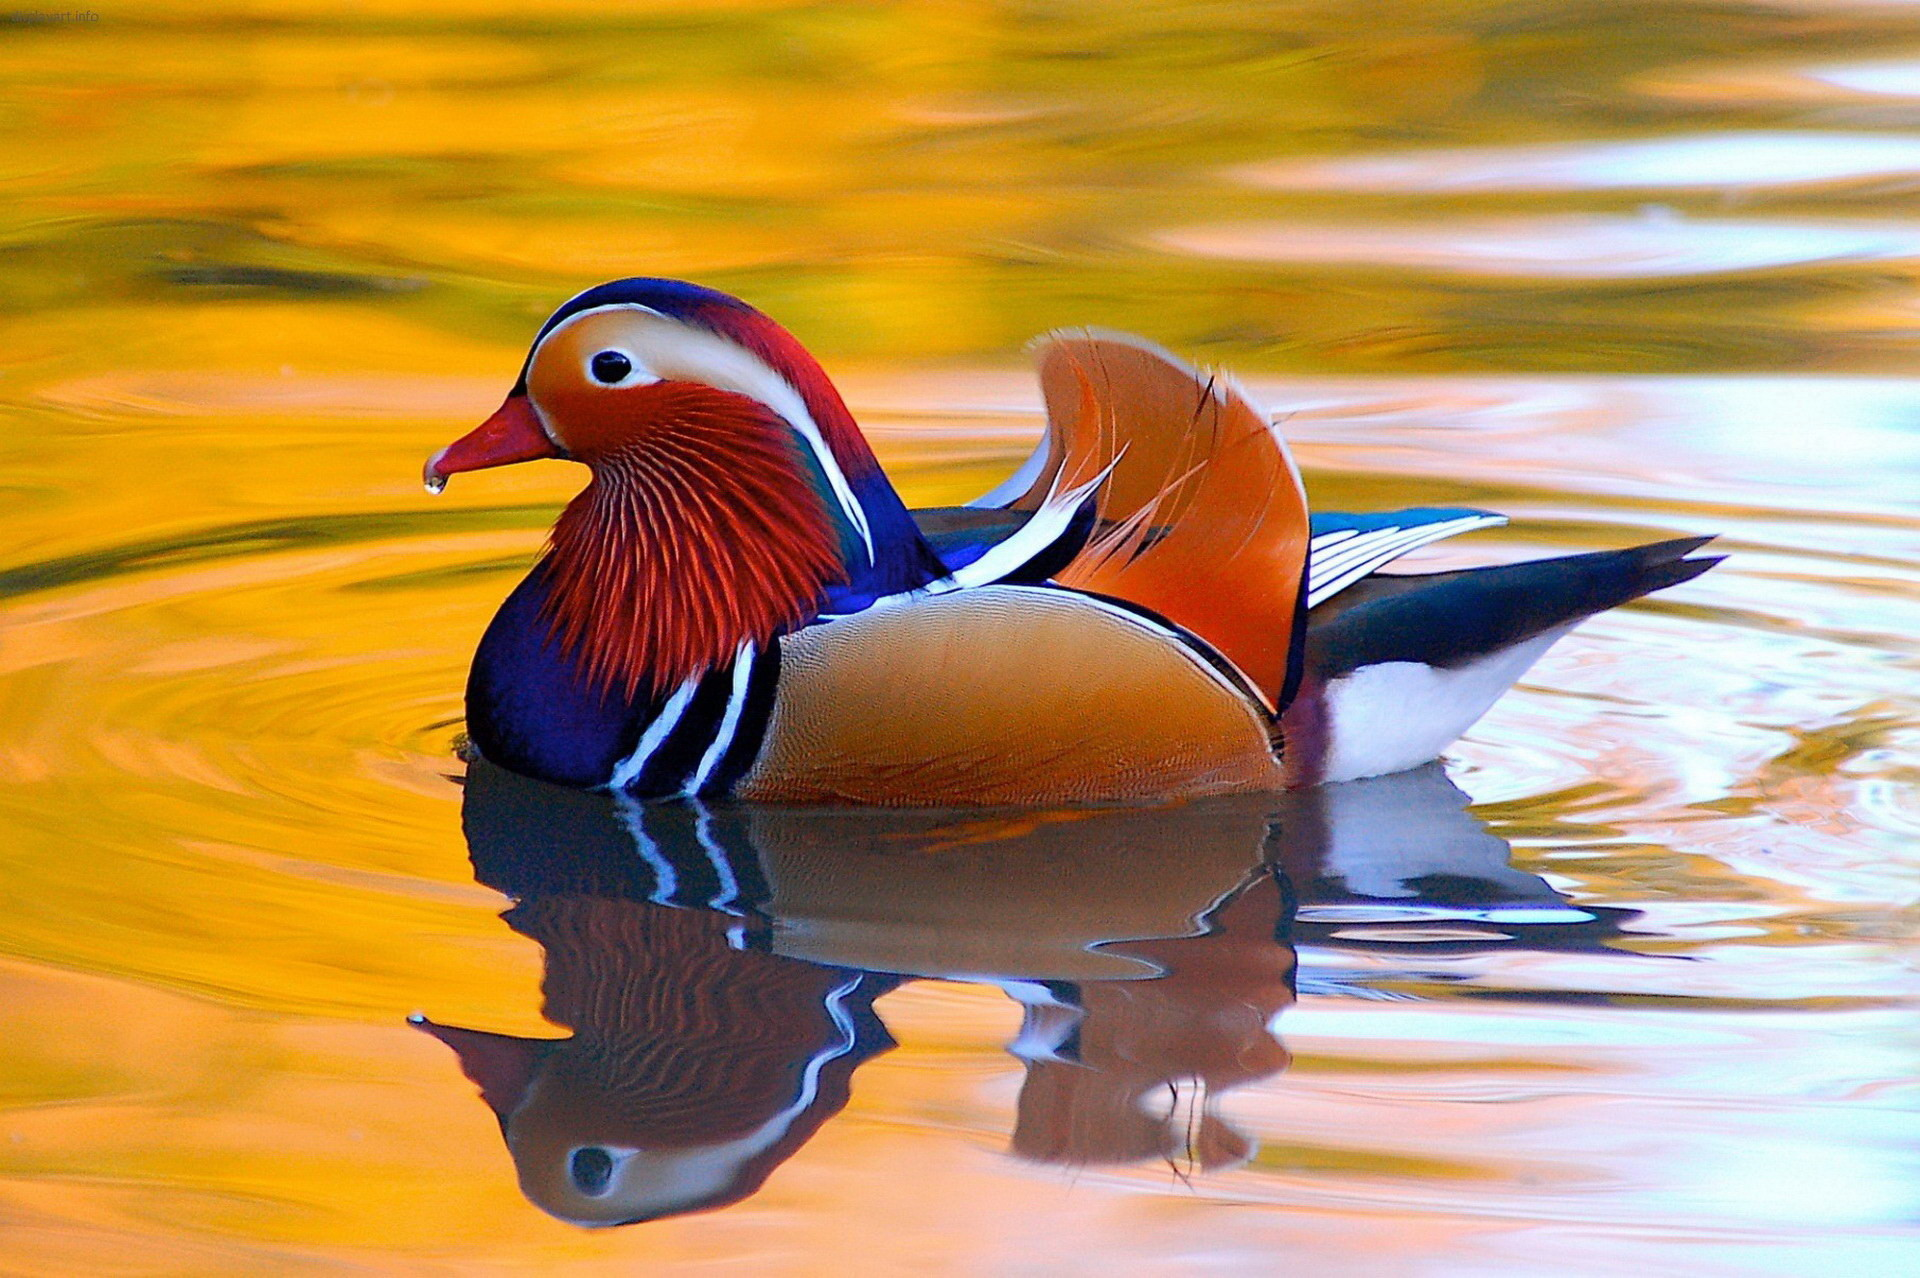 Res: 1920x1278, Animal - Mandarin Duck Animal Bird Duck Colorful Wallpaper